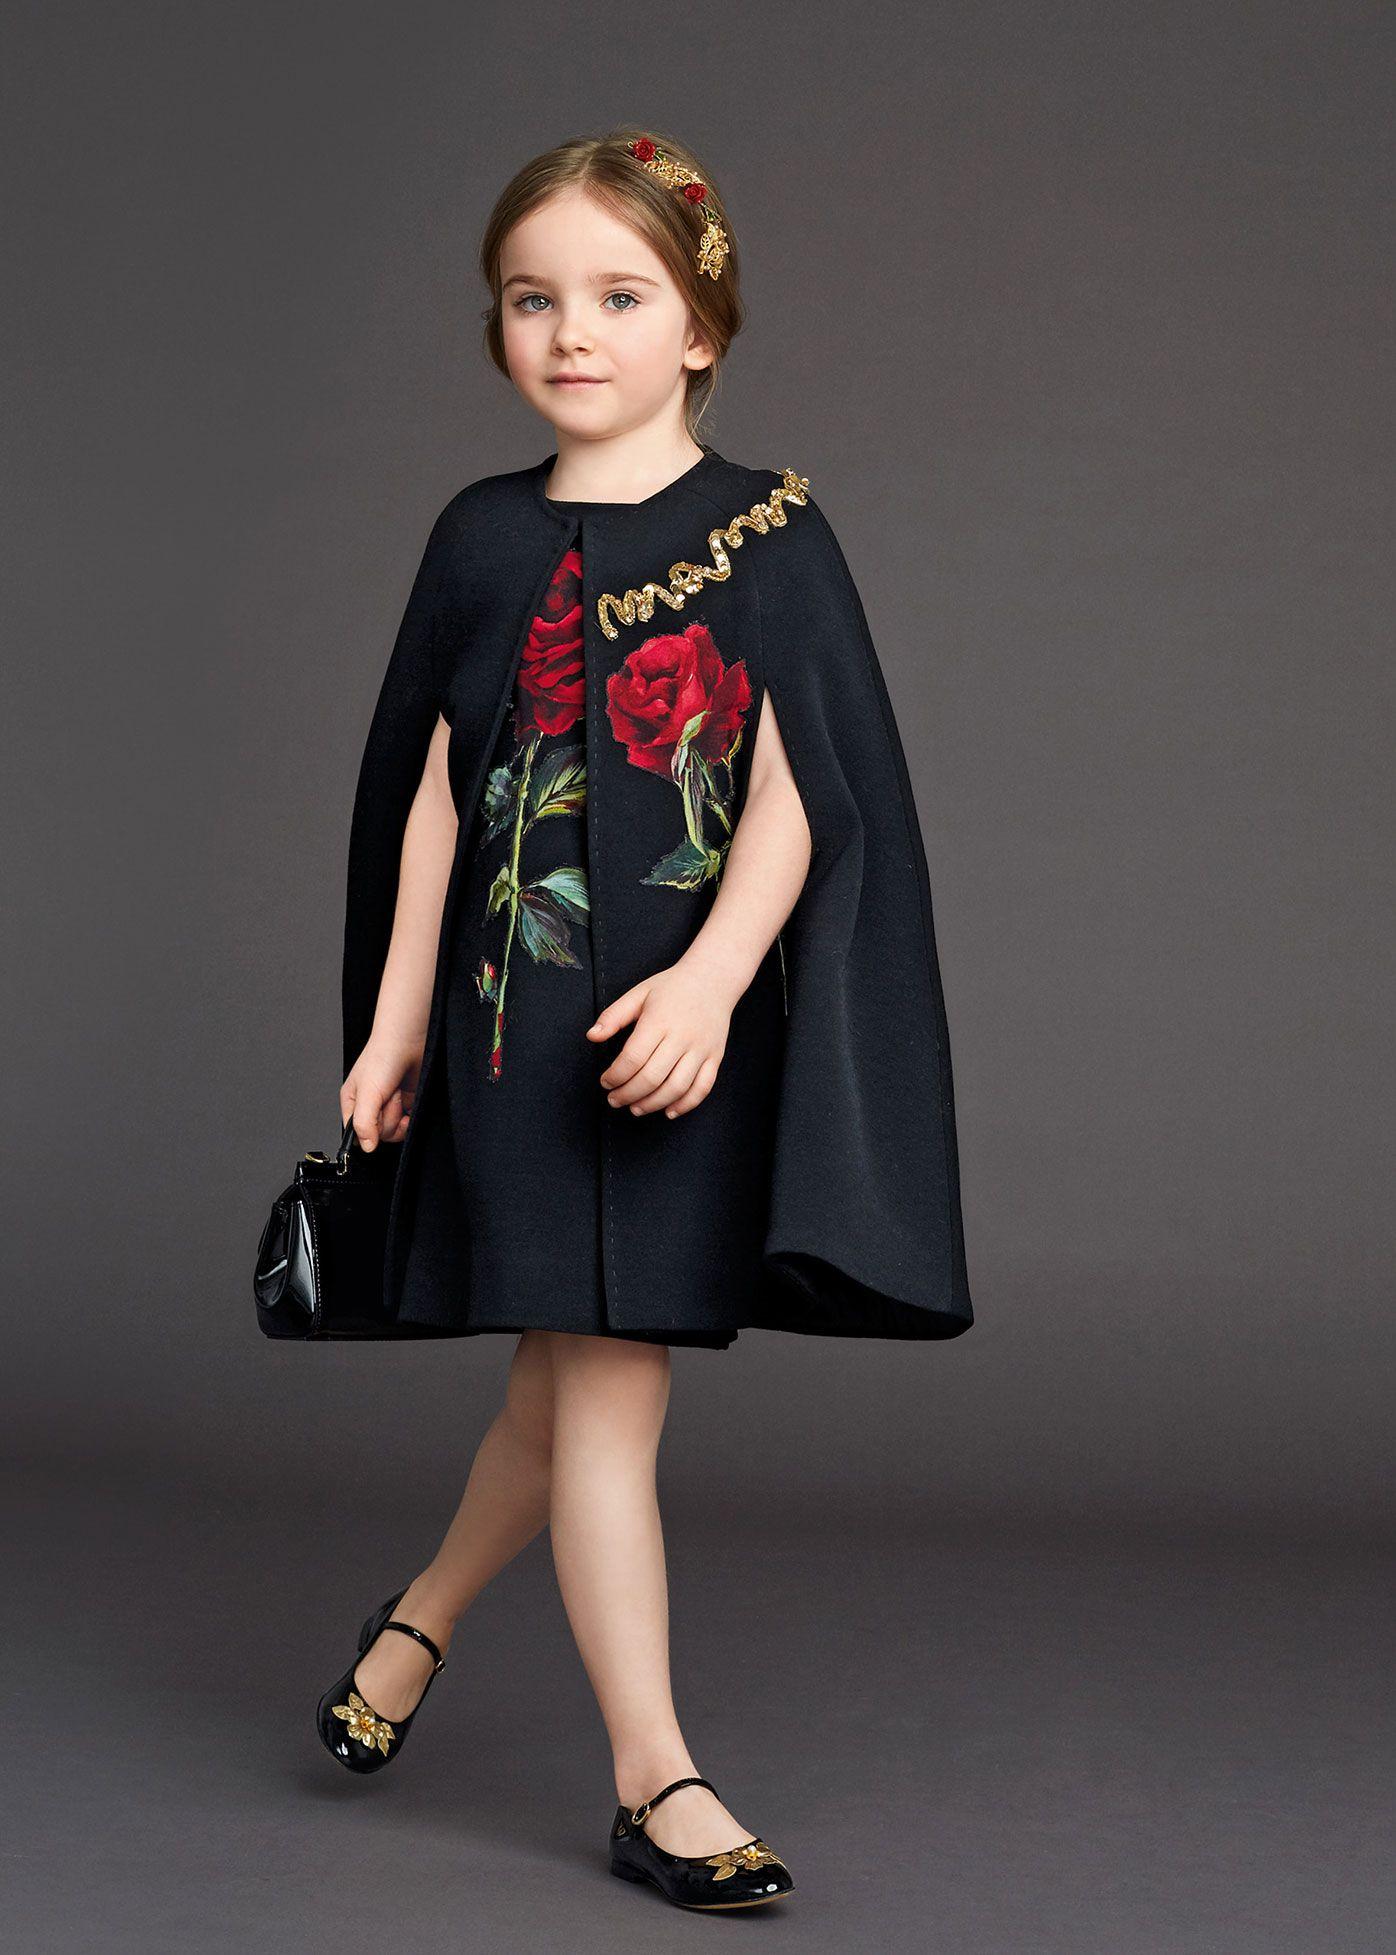 eac9e20ca4b03 Dolce   Gabbana Children Winter Collection 2016